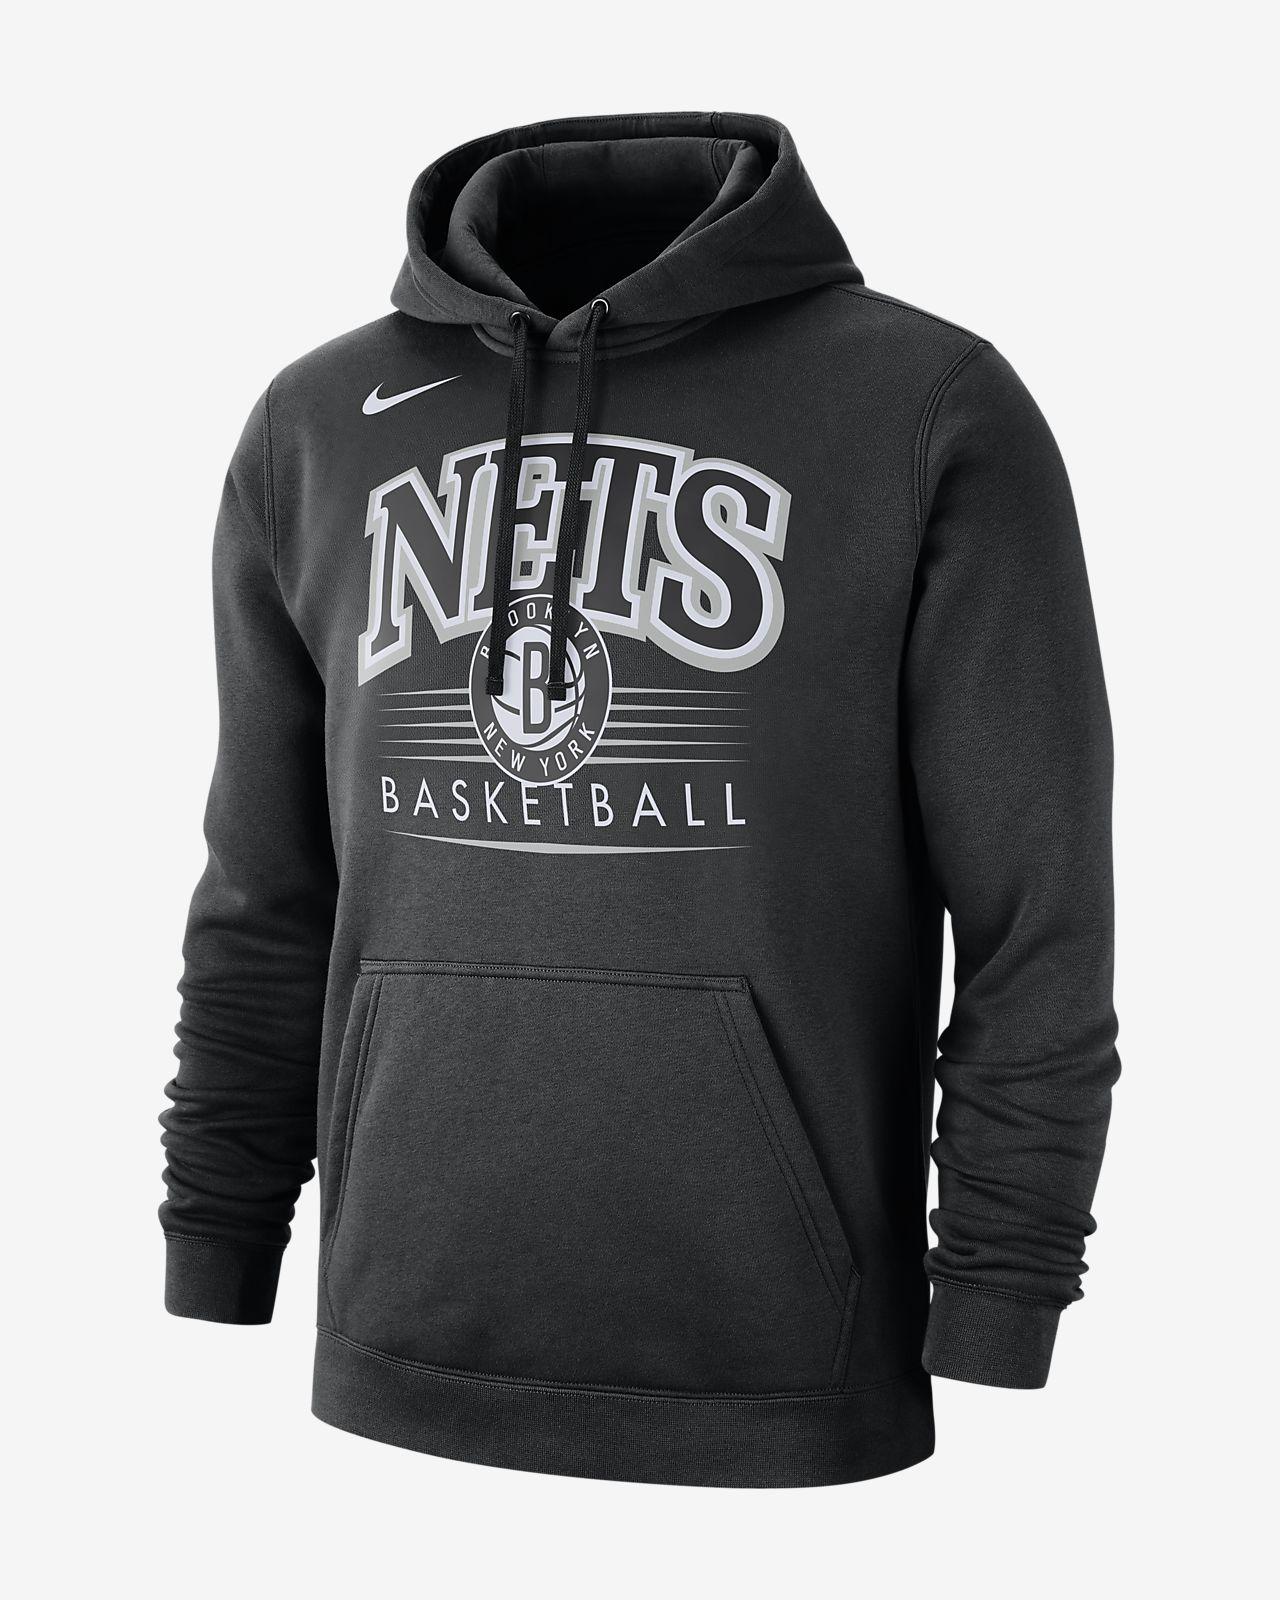 Brooklyn Nets Nike Men's NBA Hoodie